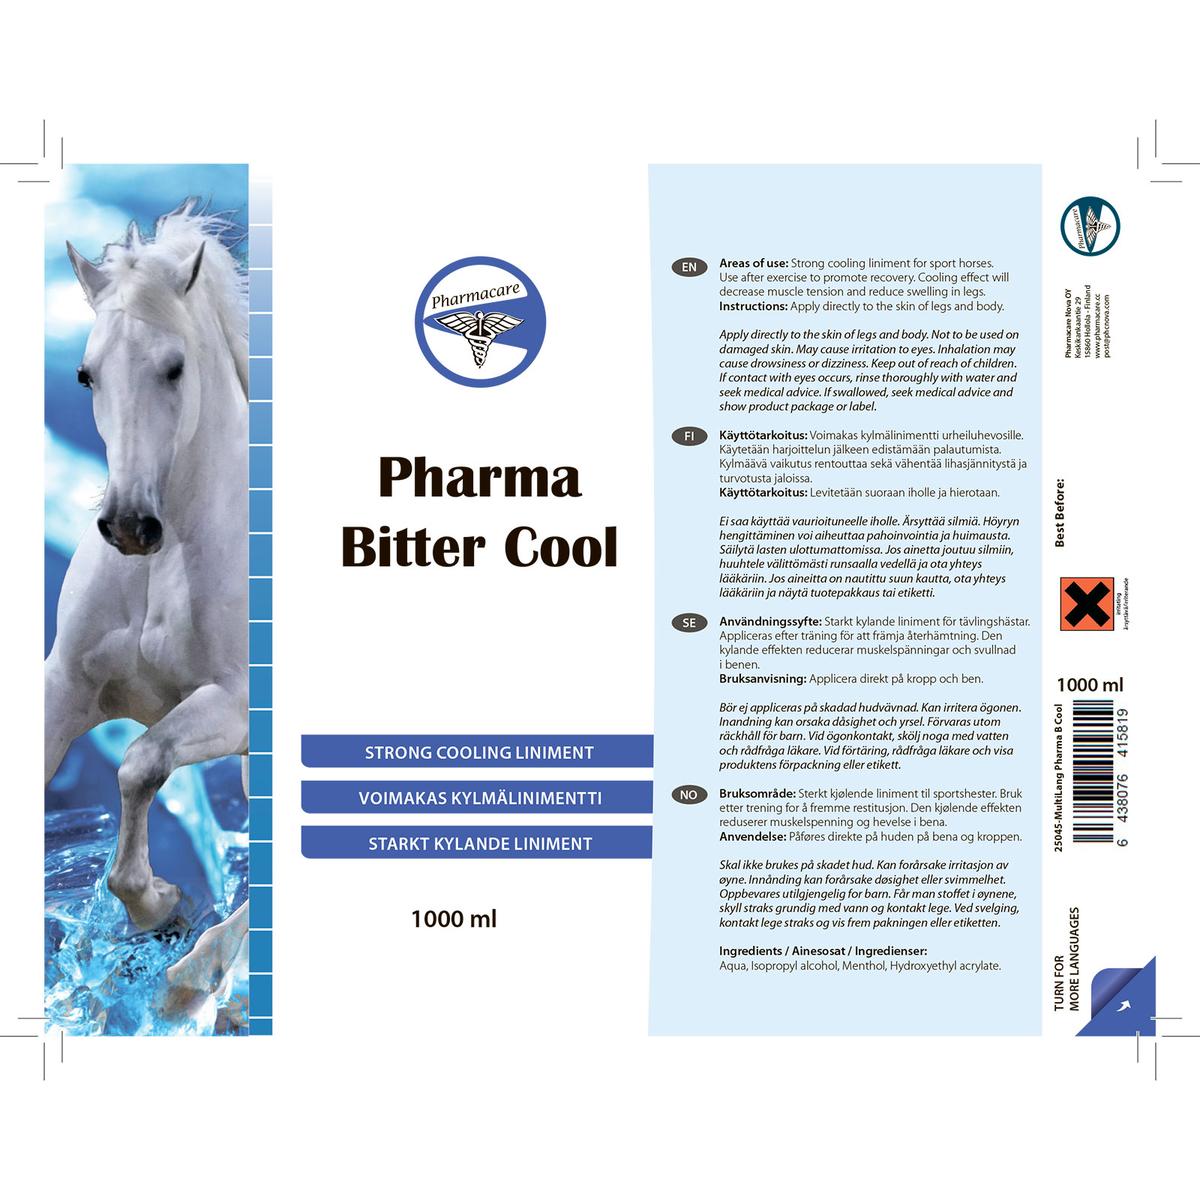 Pharma Bitter Cool 1000ml Horze